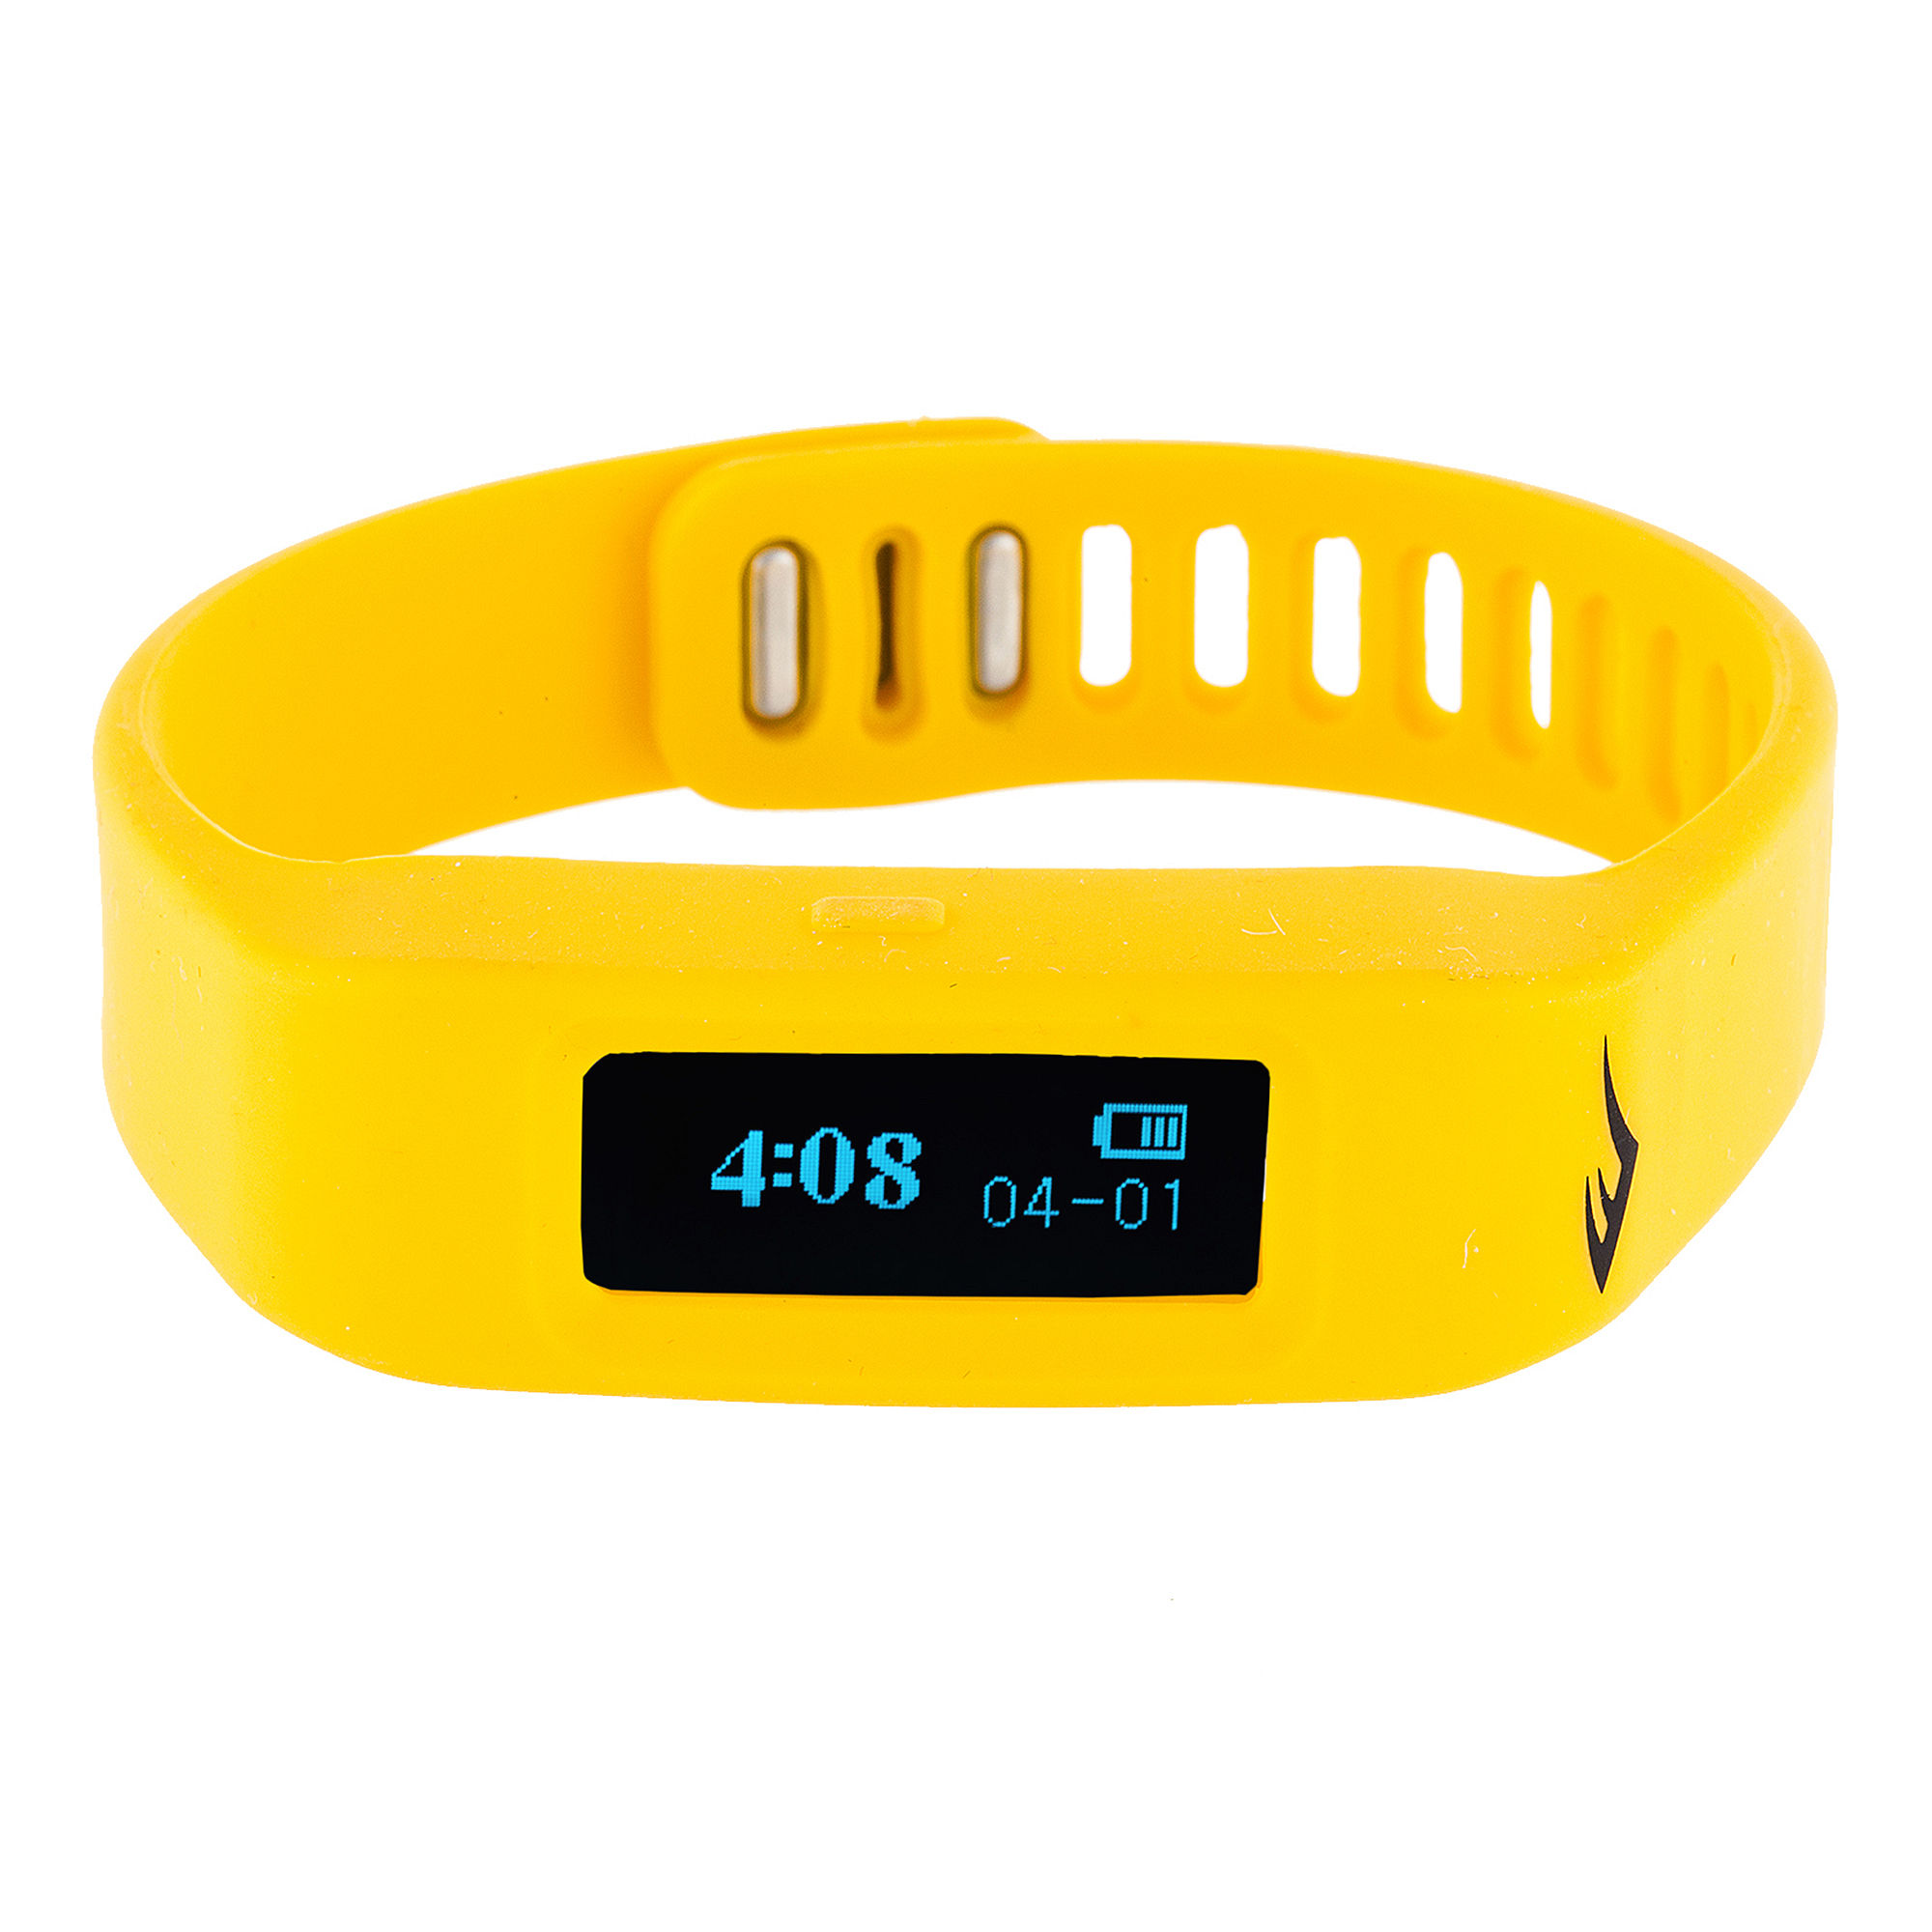 Everlast Activity Tracker Yellow Silicone Strap Digital Sport Watch